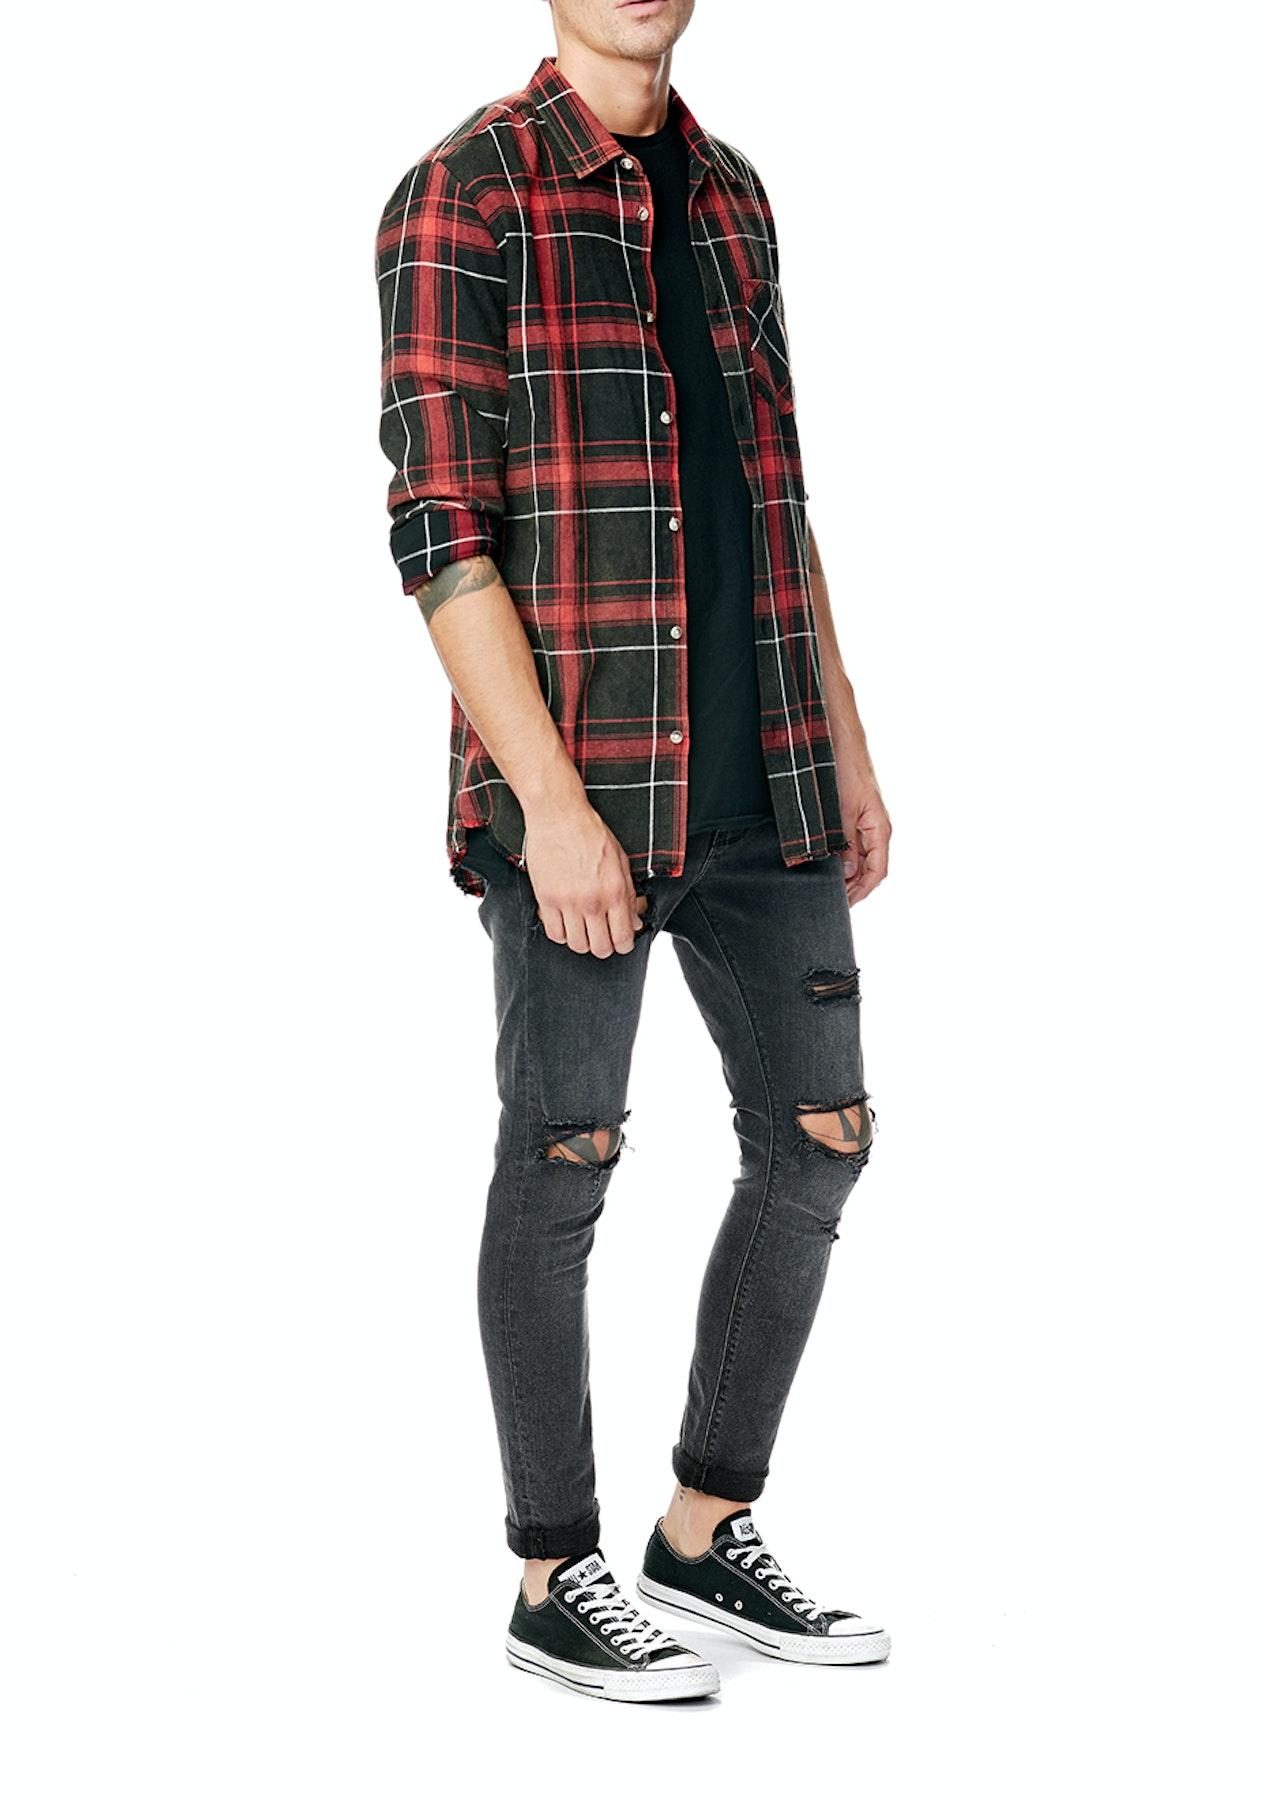 A Brand - Shred Check Shirt - Shred Red